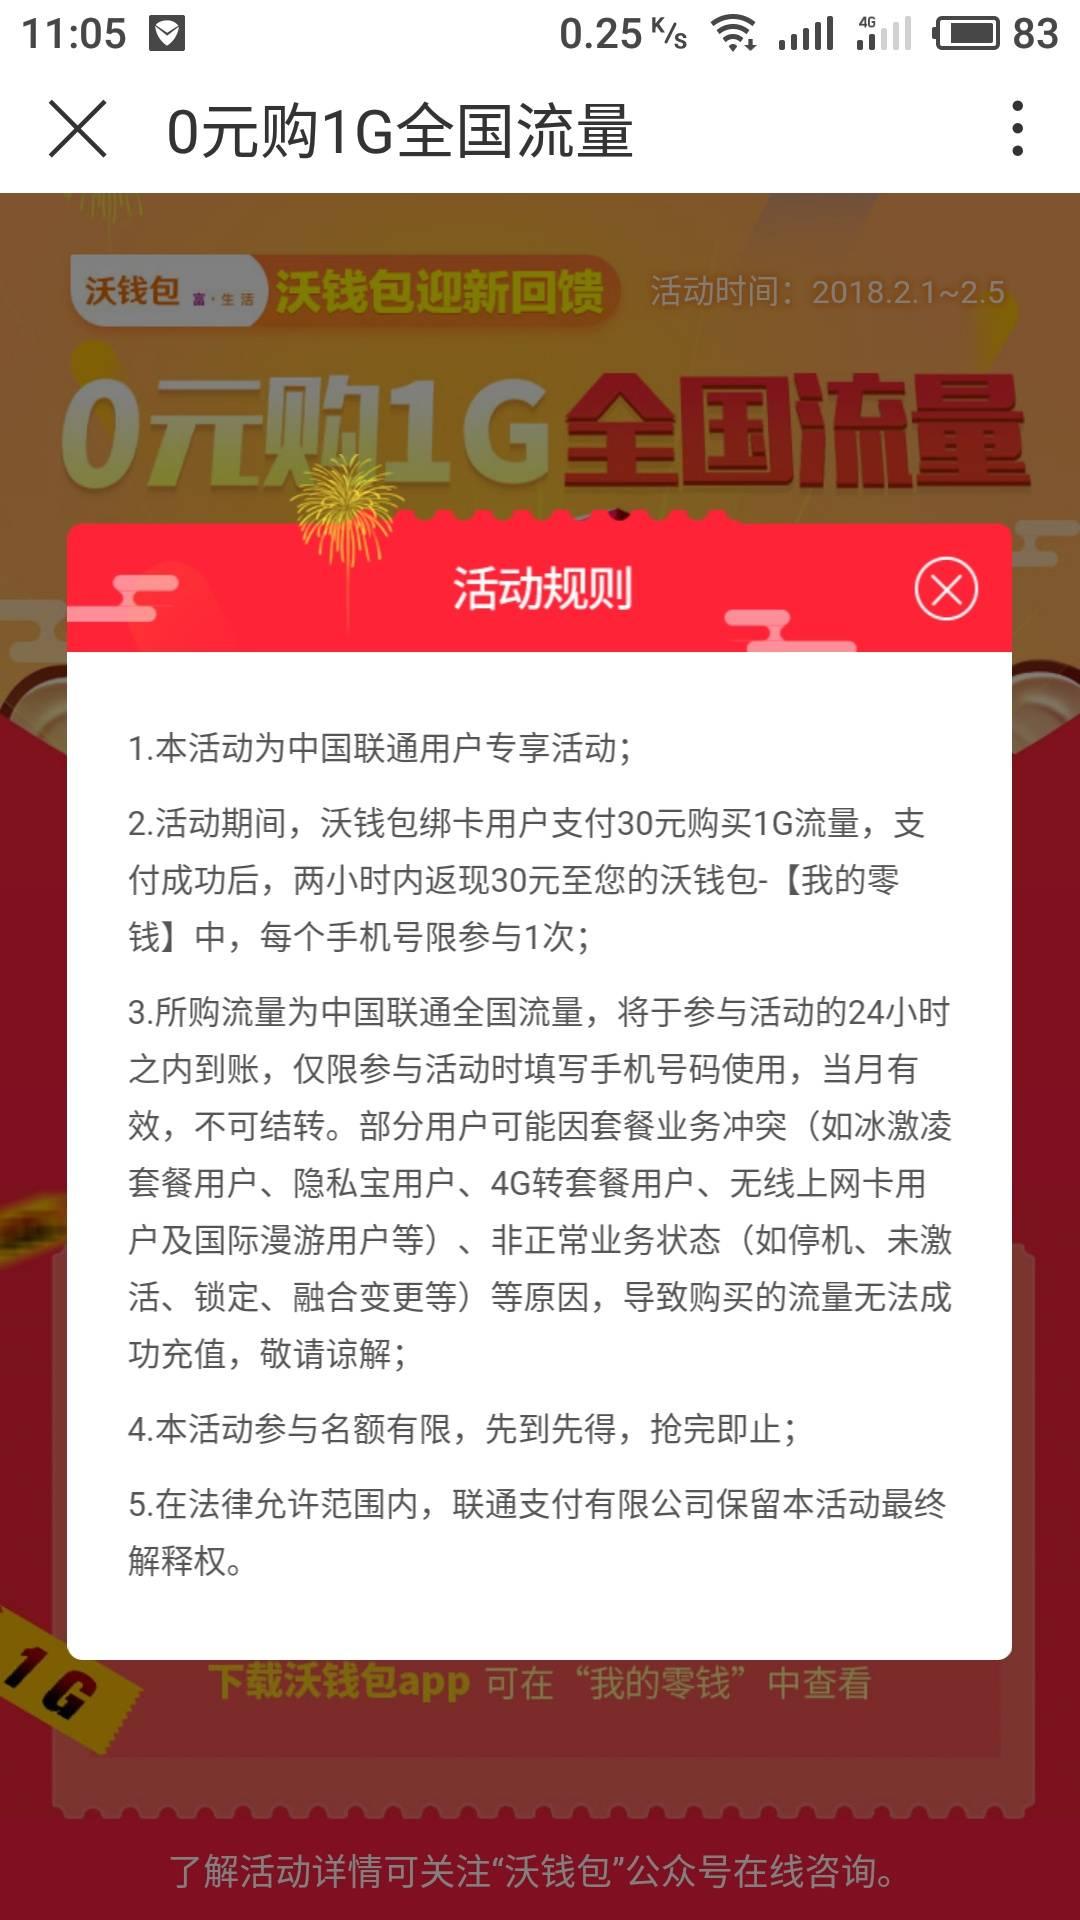 https://file.bayunhome.com/ubb_img/4e7c65ea53c404696846ac08e7db6dc4.jpg?src=https://wx1.vv1234.cn/o_1c57lasugr8p1uvm1rvs1dlf1rrca.jpg